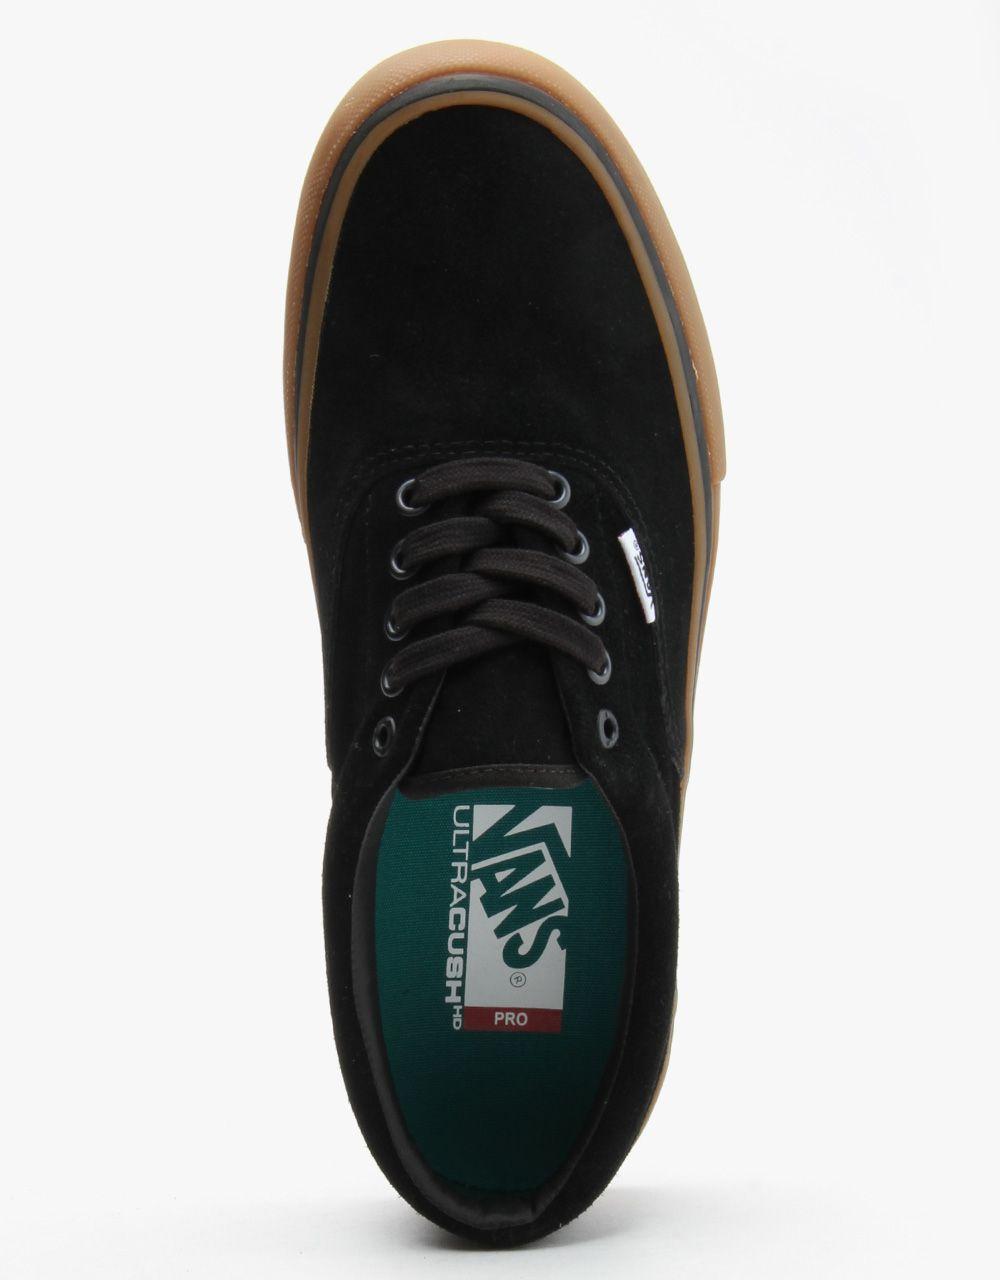 Skate shoes uk - Vans Era Pro Skate Shoes Black Gum Routeone Co Uk